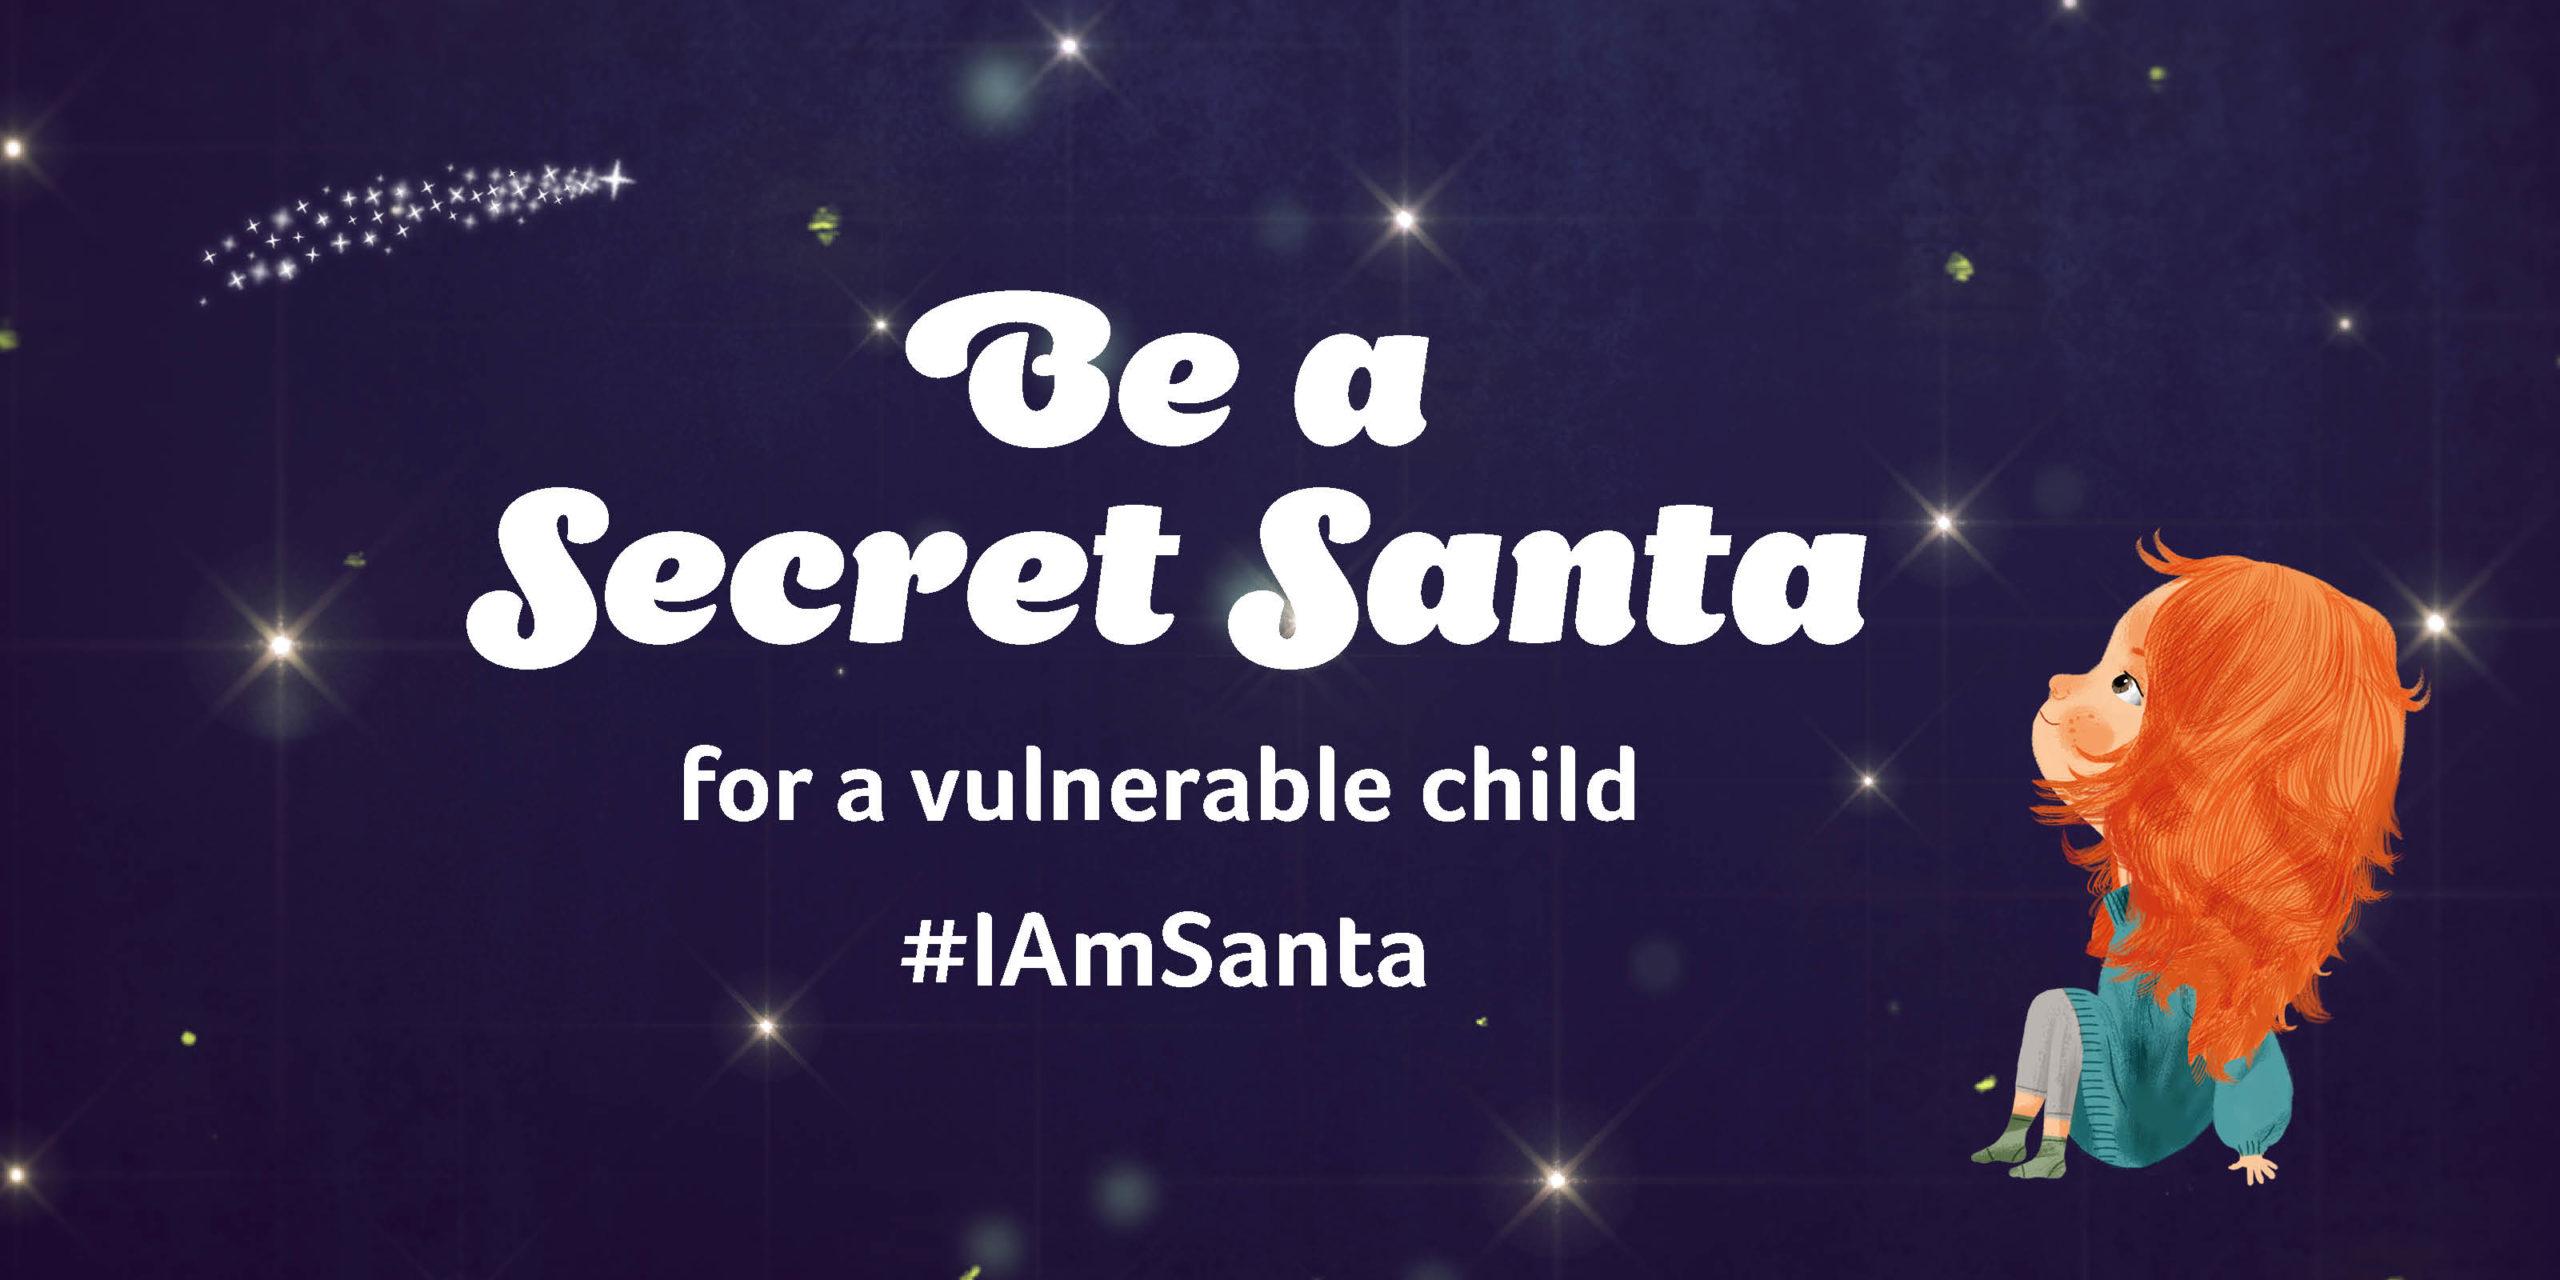 Be a Secret Santa